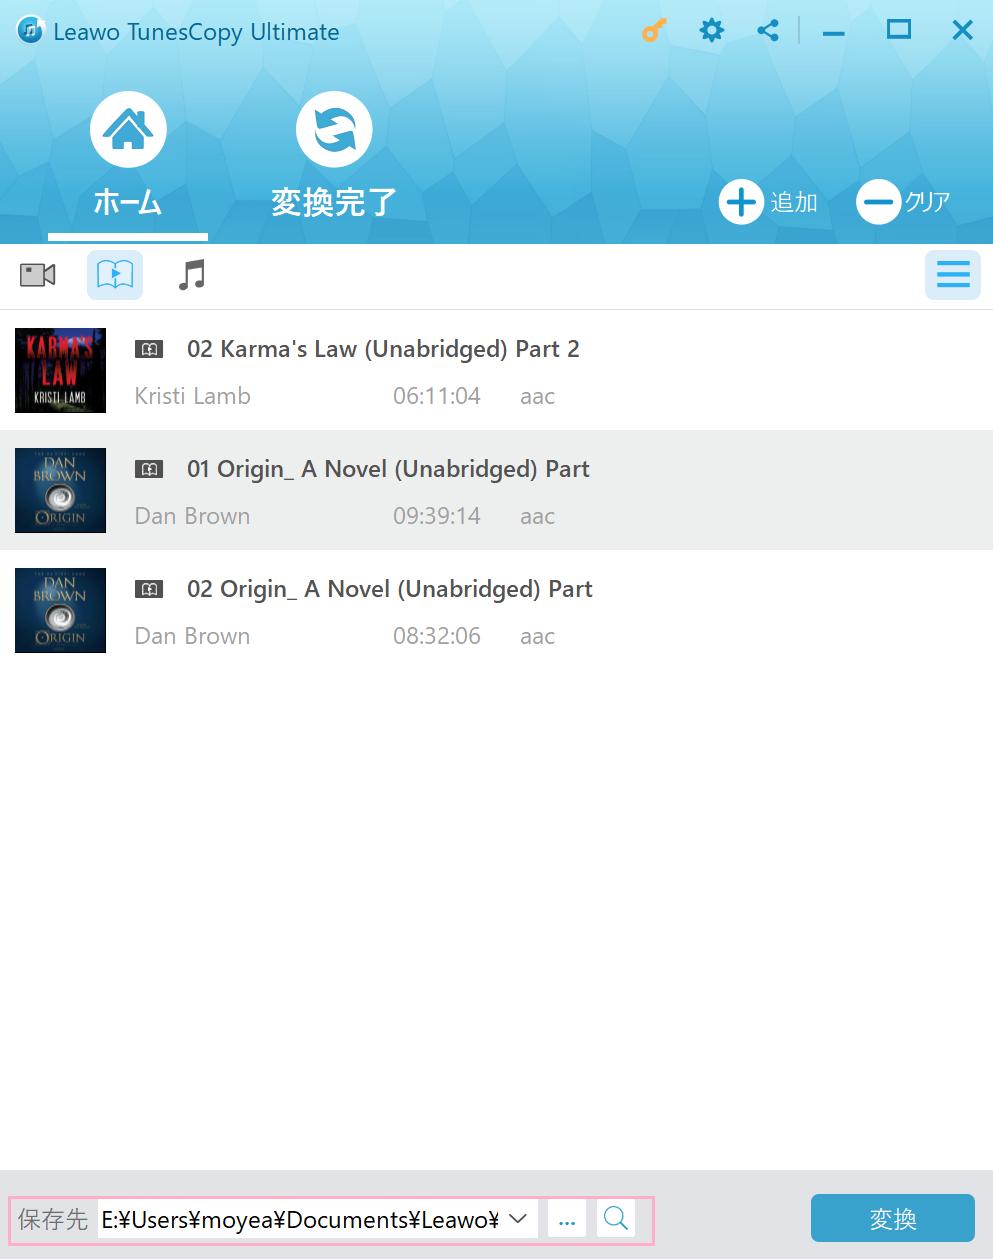 Stream iTunes DRM M4B Audiobook to Roku